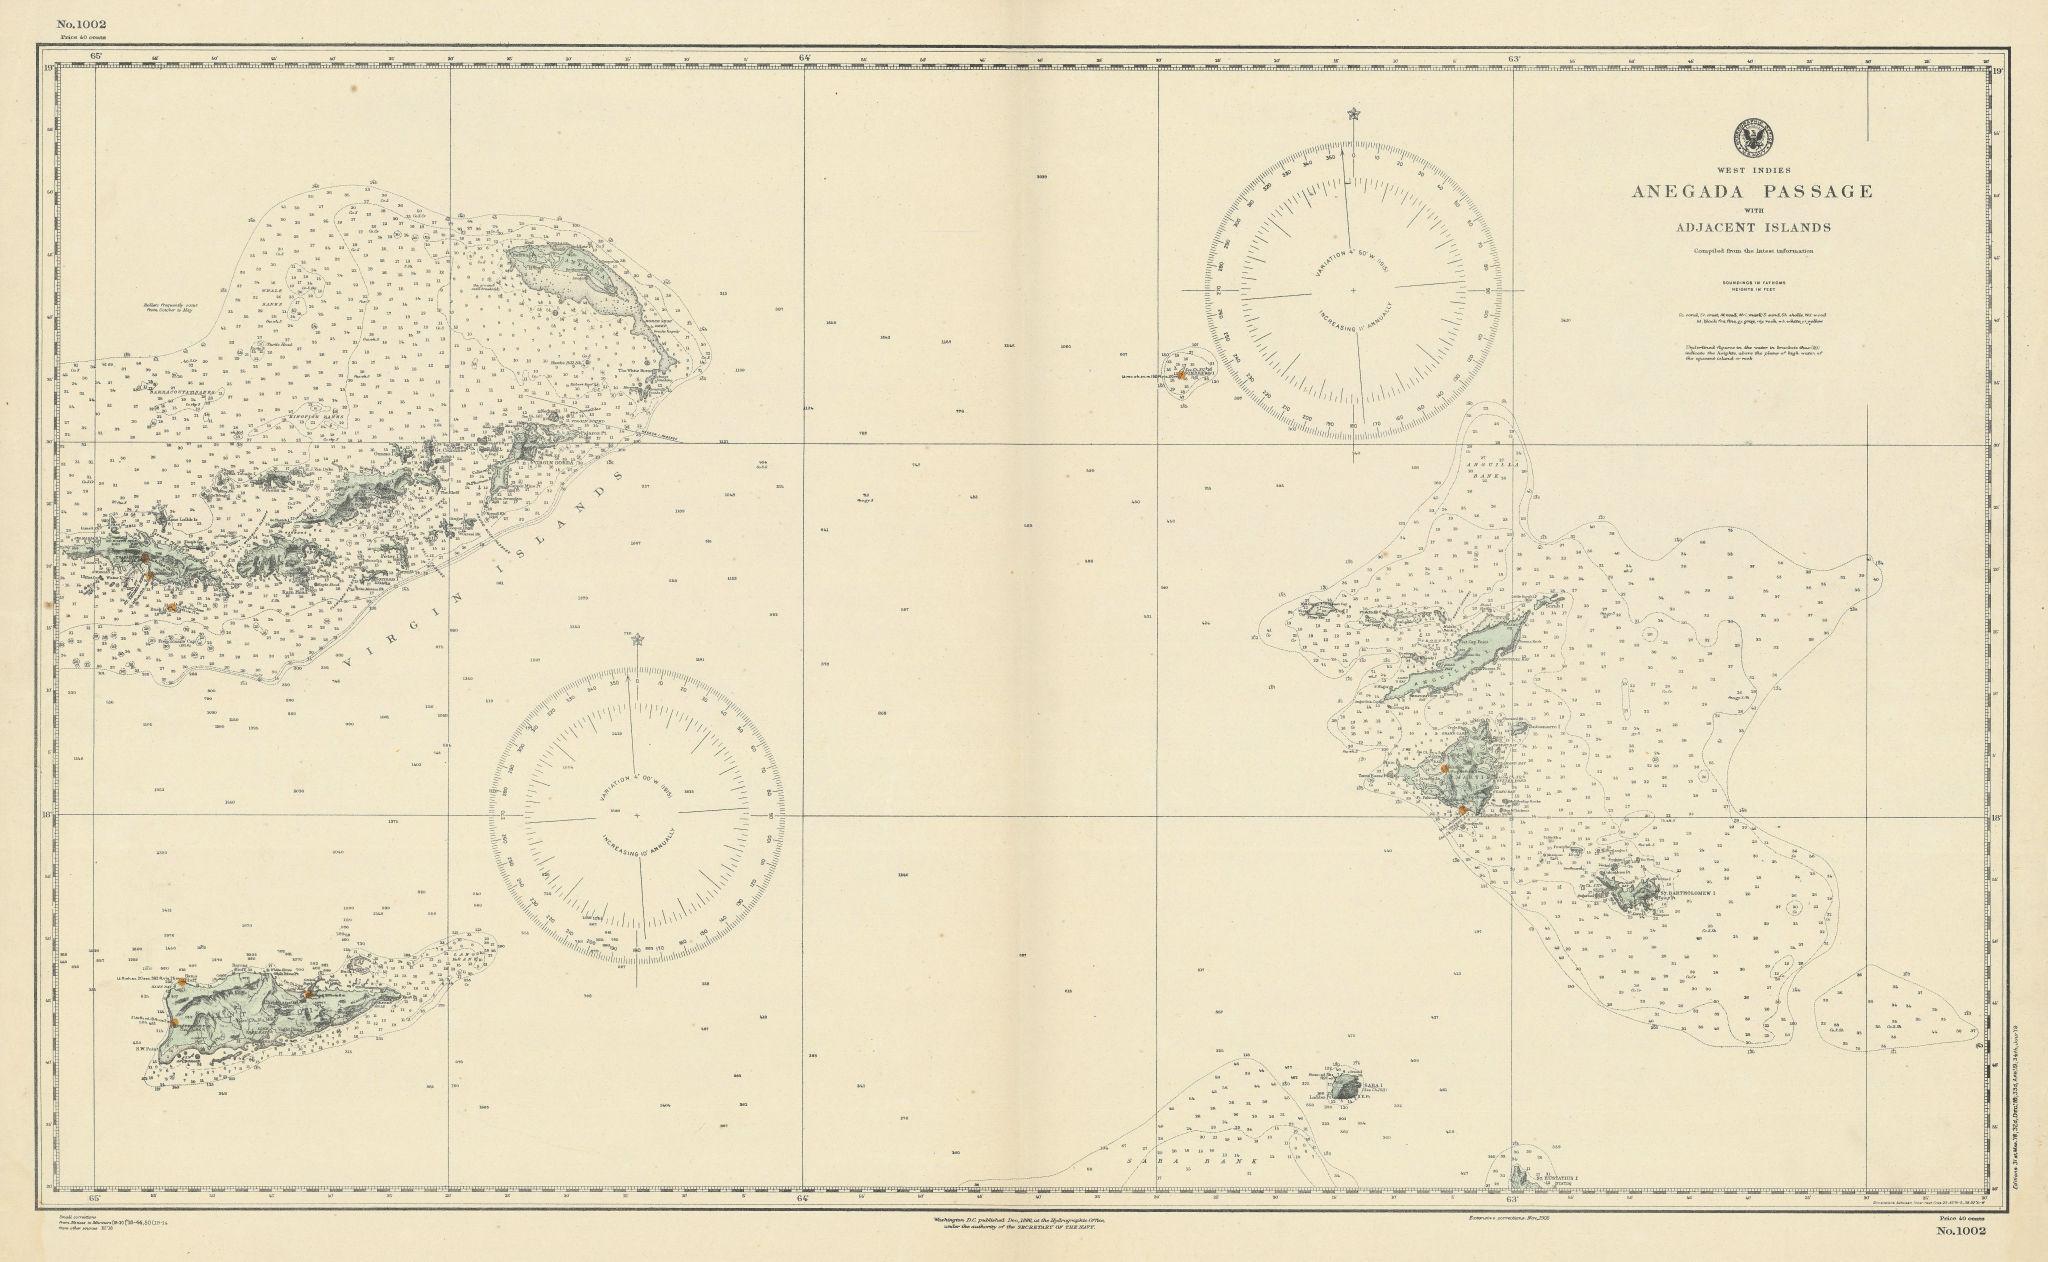 Anegada Passage Virgin Islands St Martin Anguilla US Navy chart 1886 (1919) map